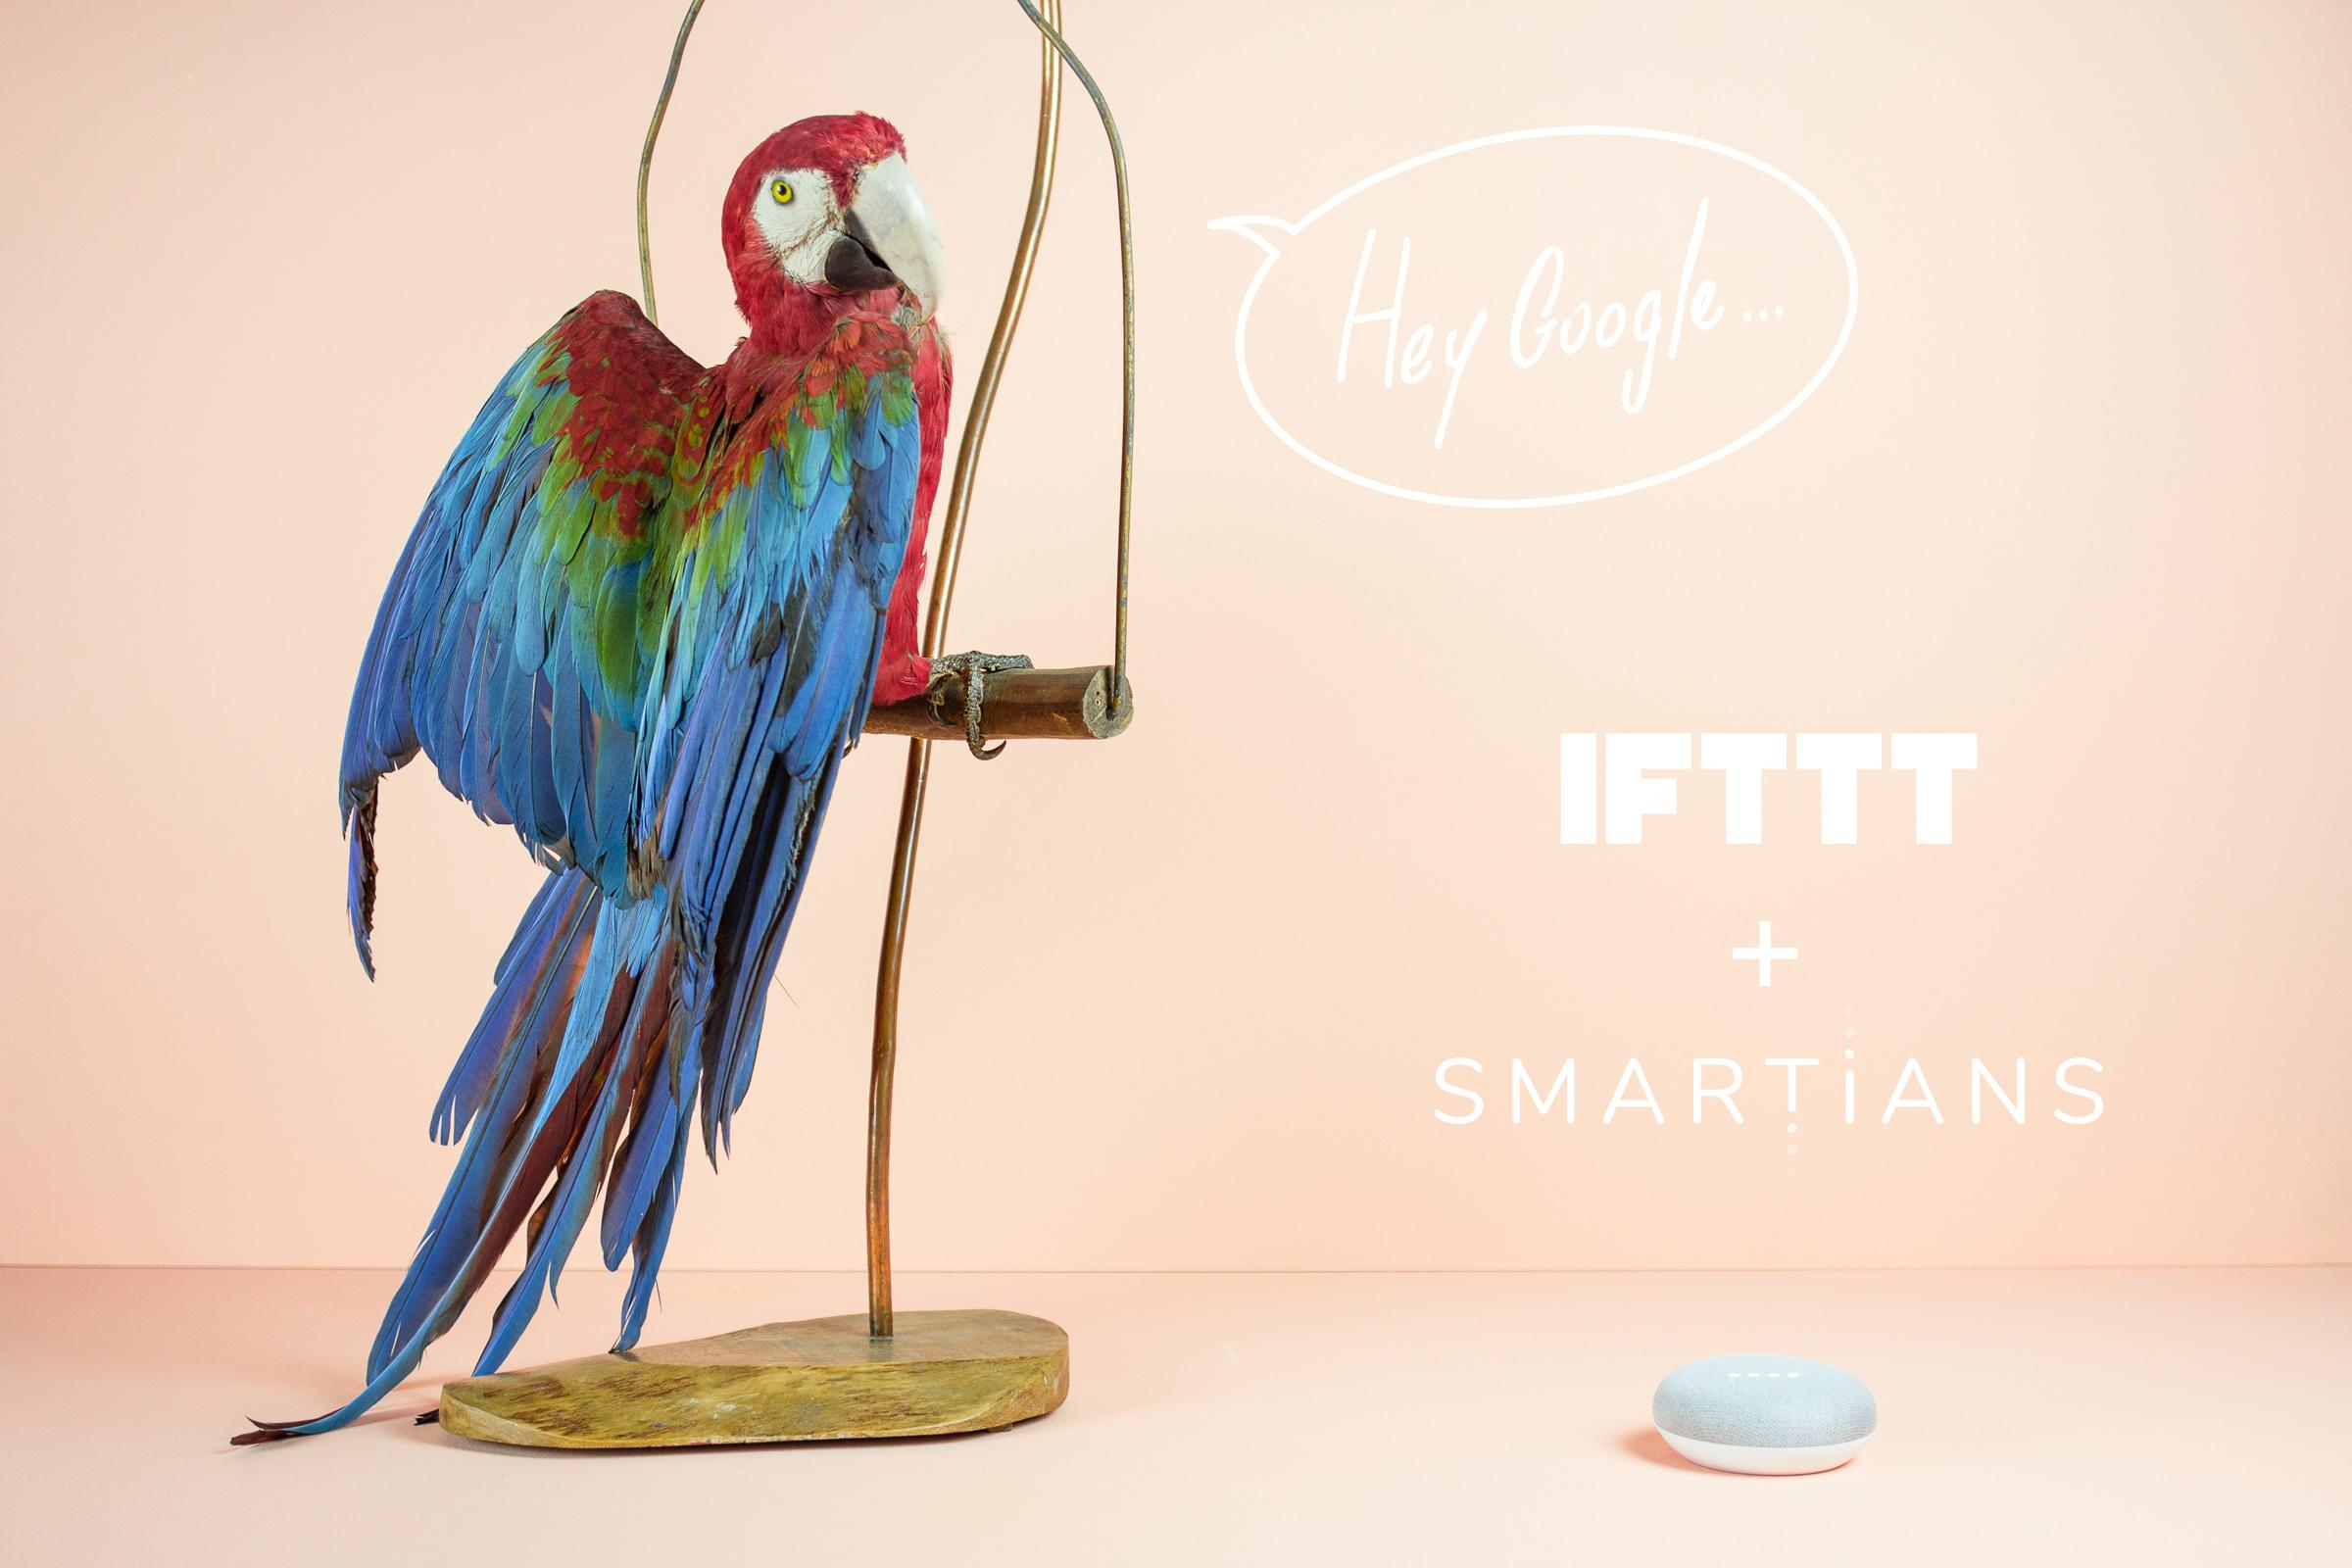 Smartians-10-edit.jpg